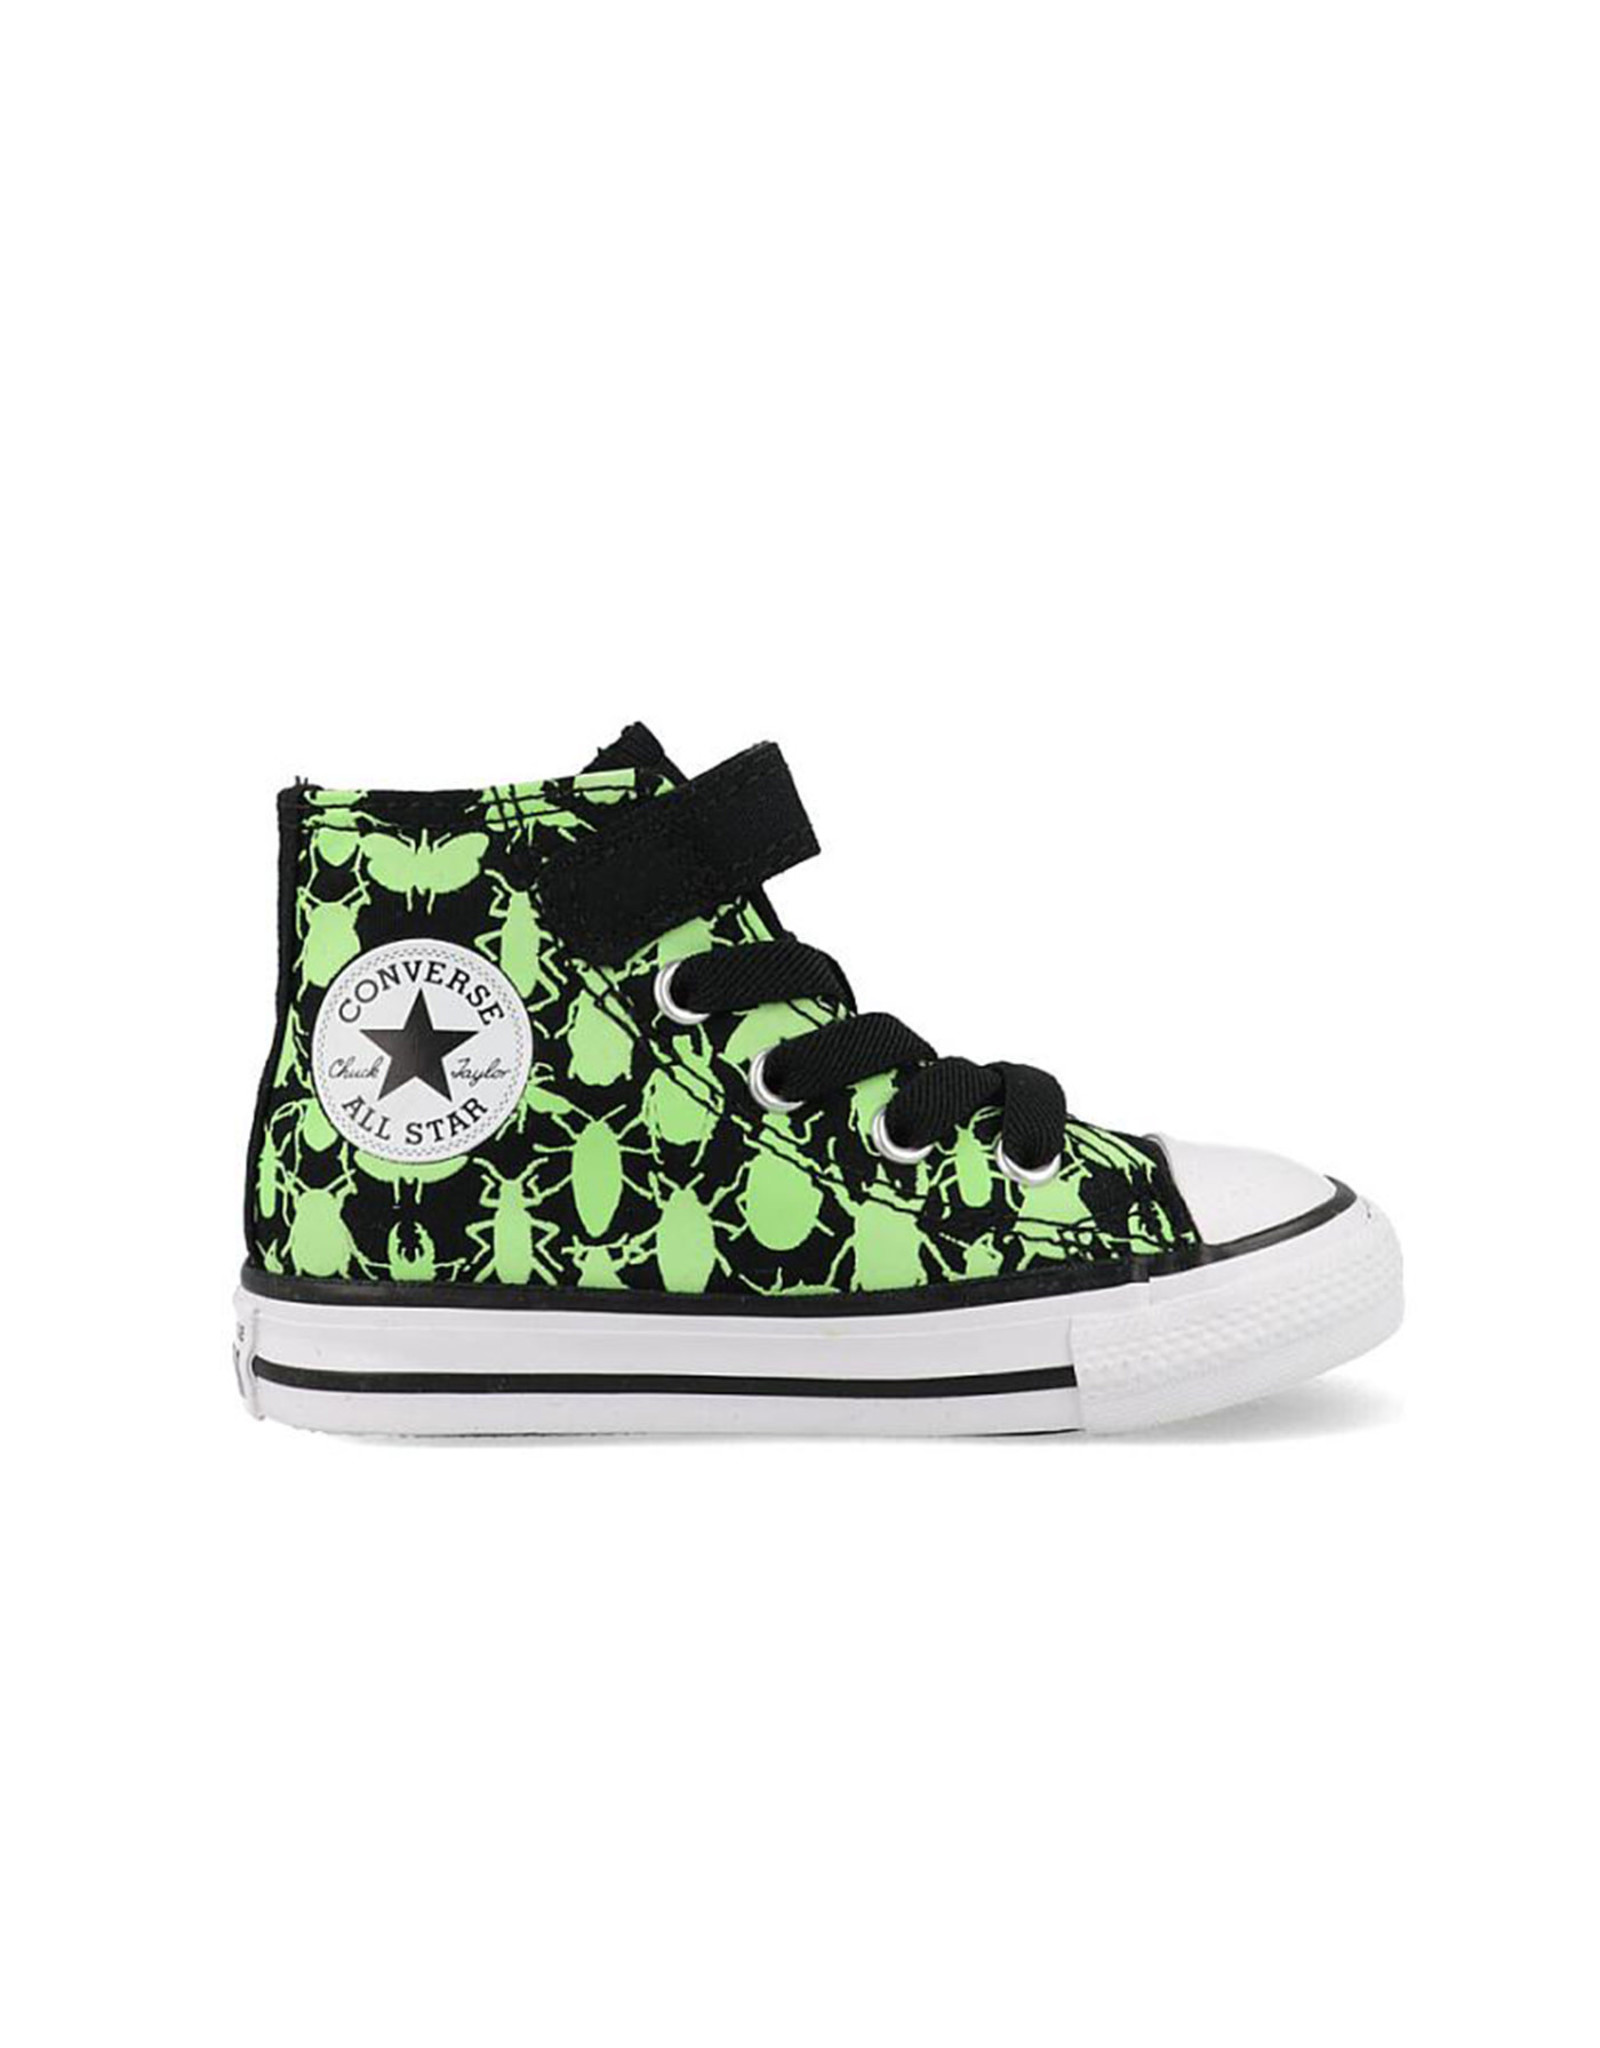 CONVERSE CHUCK TAYLOR ALL STAR 1V HI BLACK/CERAMIC GREEN/WHITE CMBUG-770717C